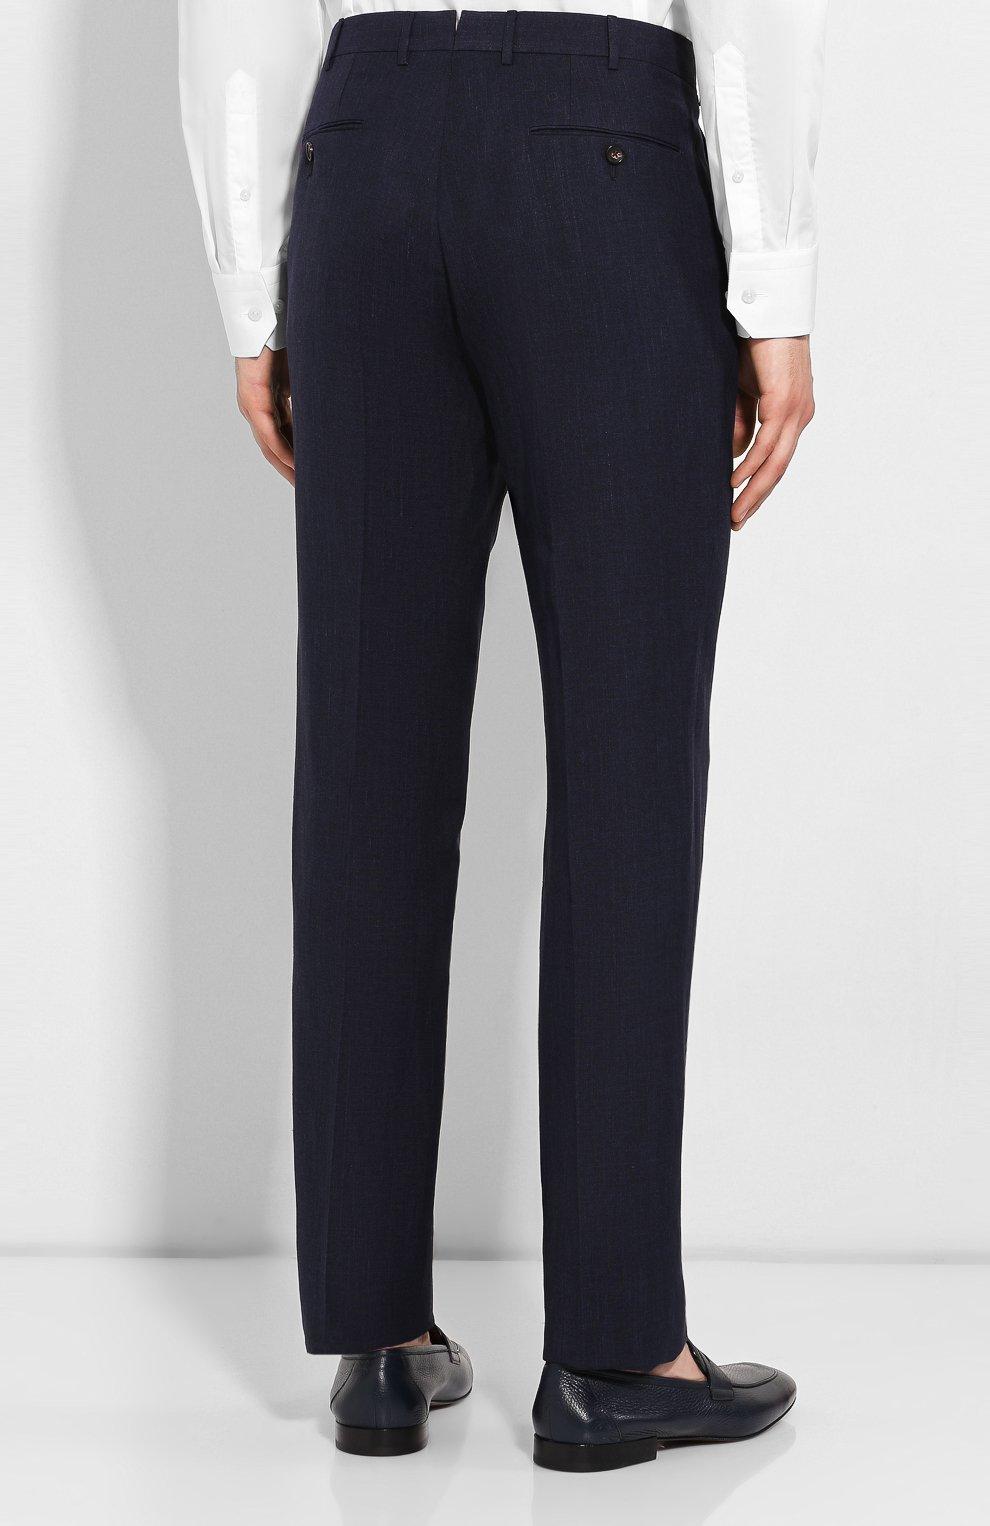 Мужские брюки из смеси льна и шерсти ERMENEGILDO ZEGNA темно-синего цвета, арт. 770F04/75TB12   Фото 4